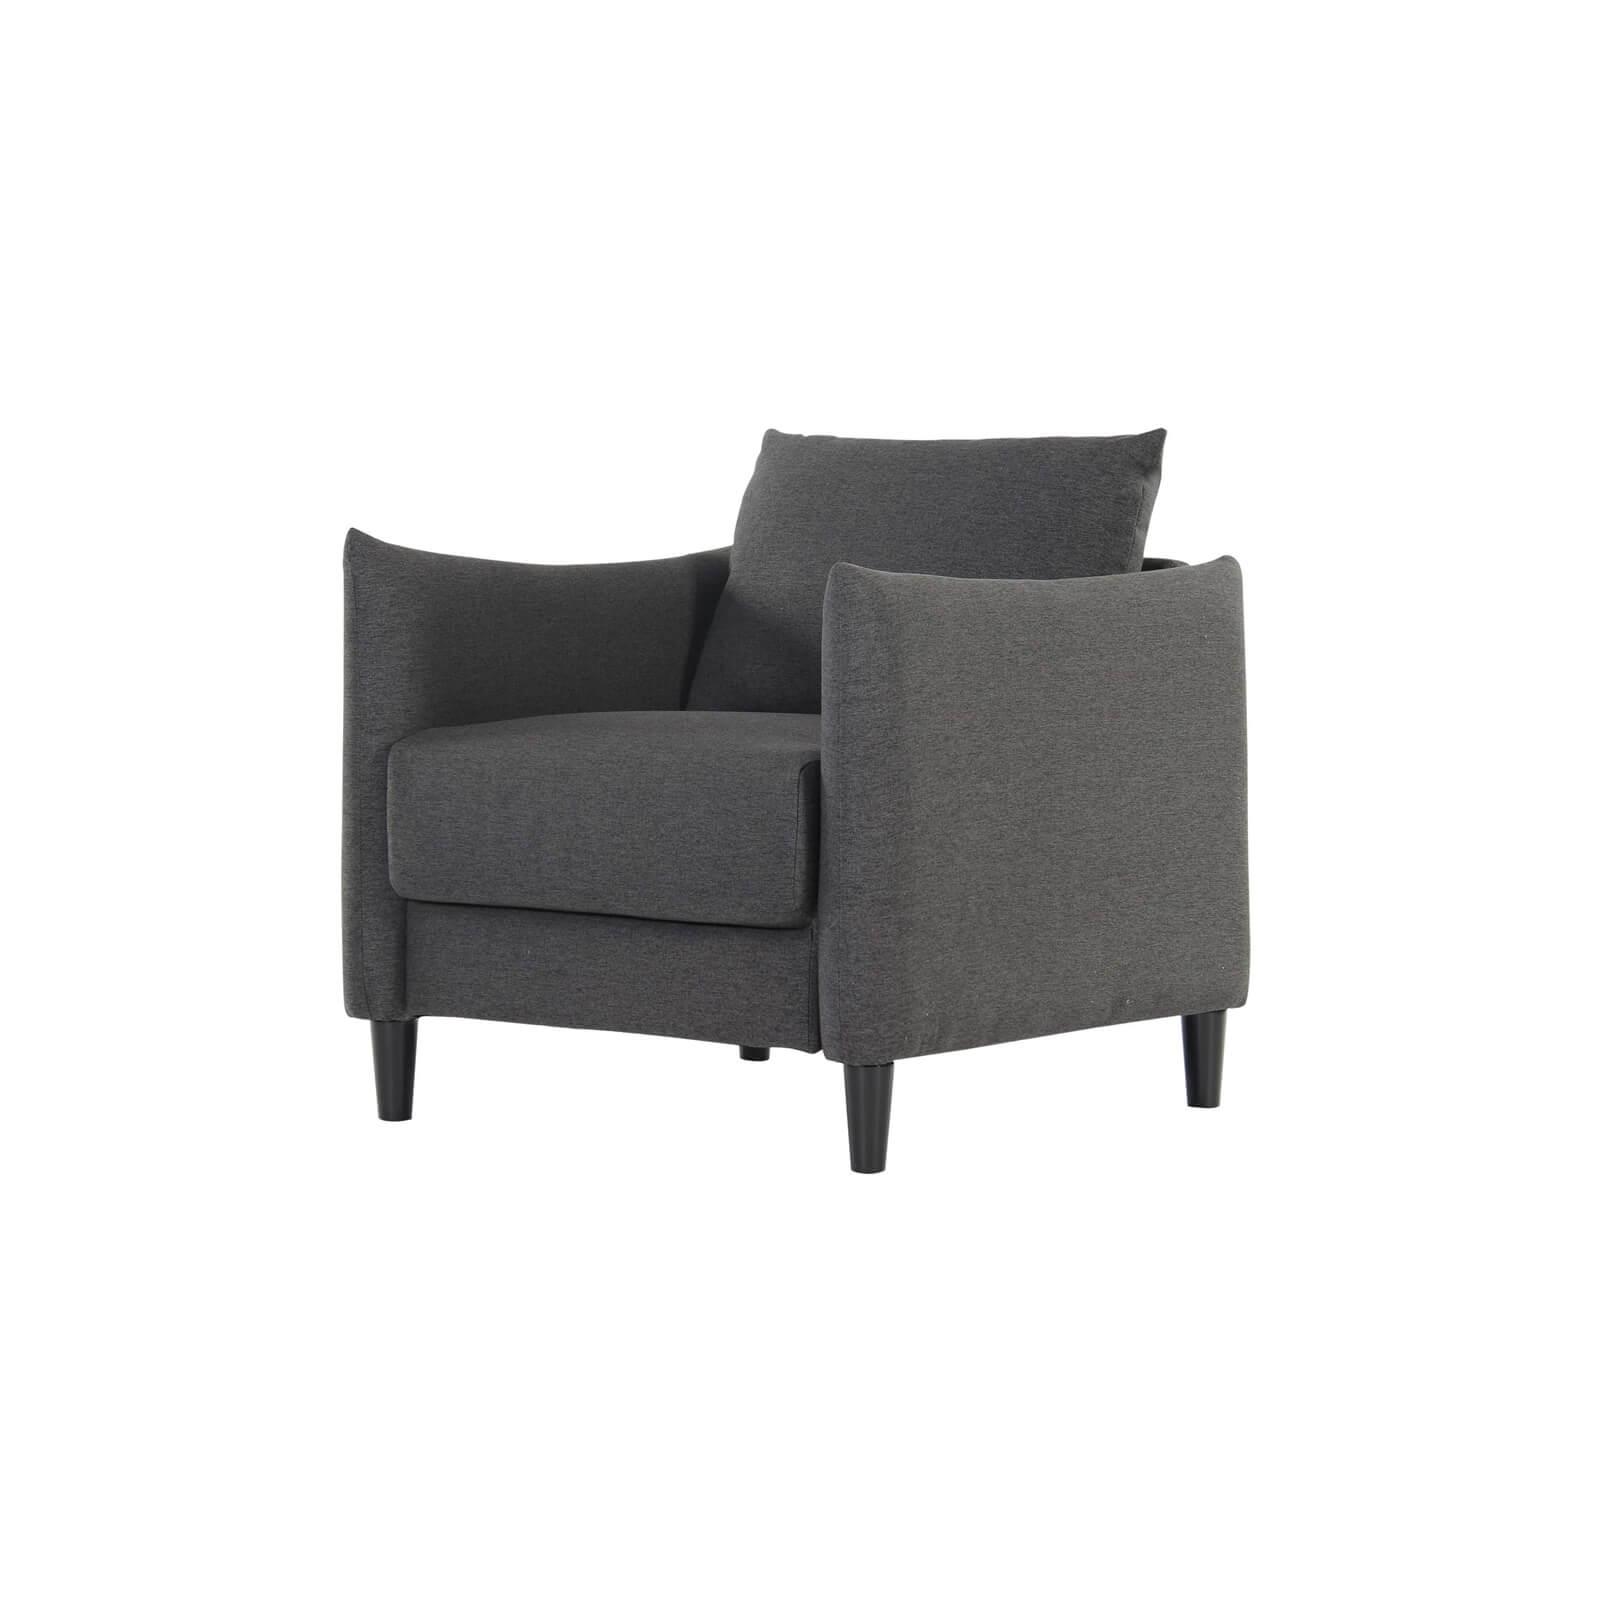 Fargo 1 Seater Armchair - Grey